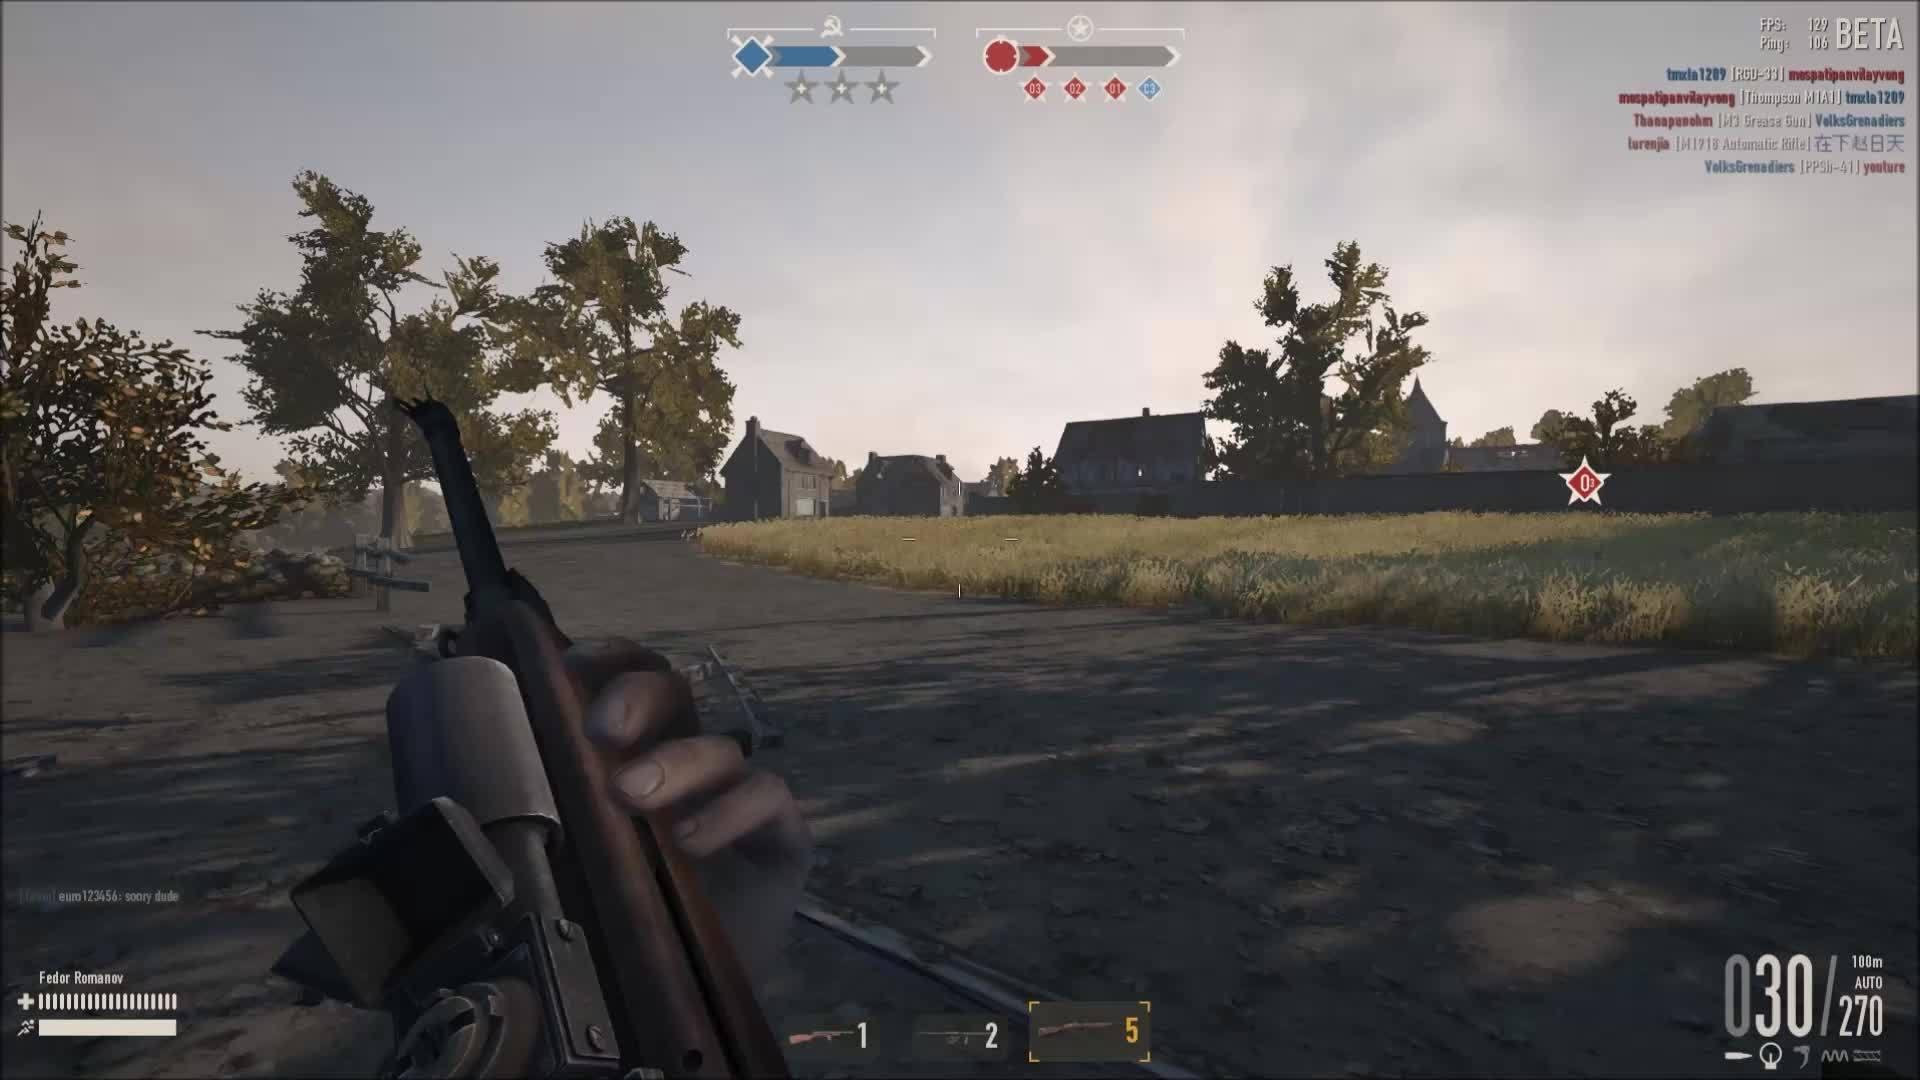 heroesandgenerals, AA bazooka GIFs